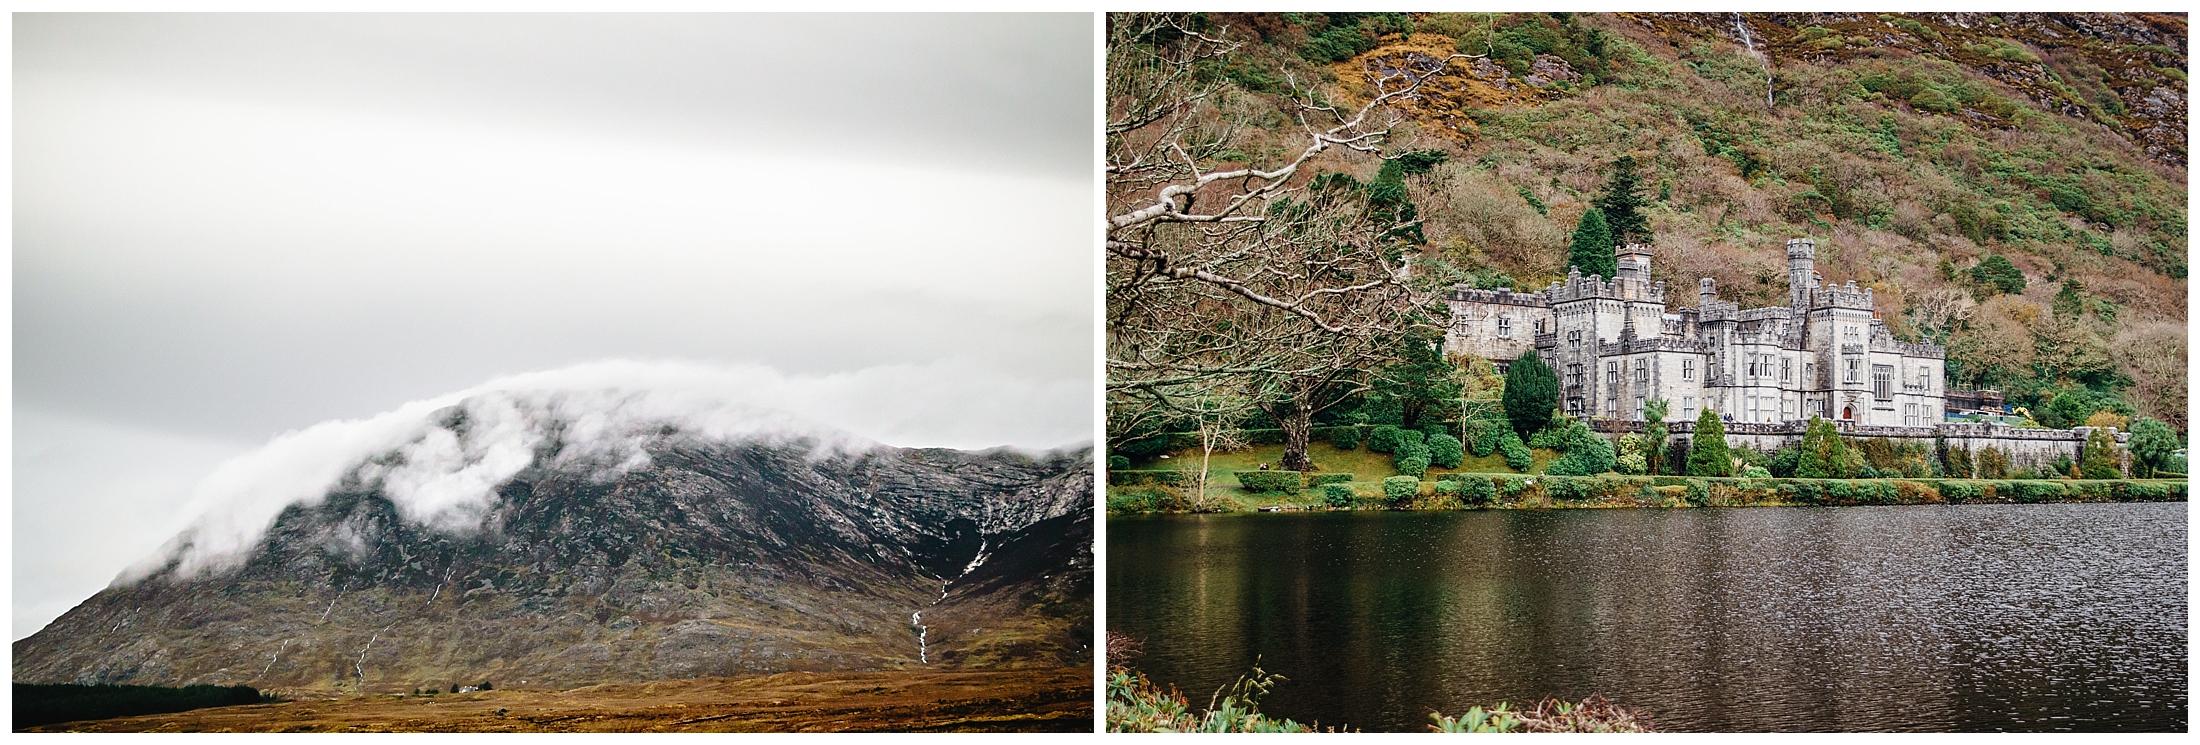 Ireland-10-Day-Itinerary-Trip3.jpg